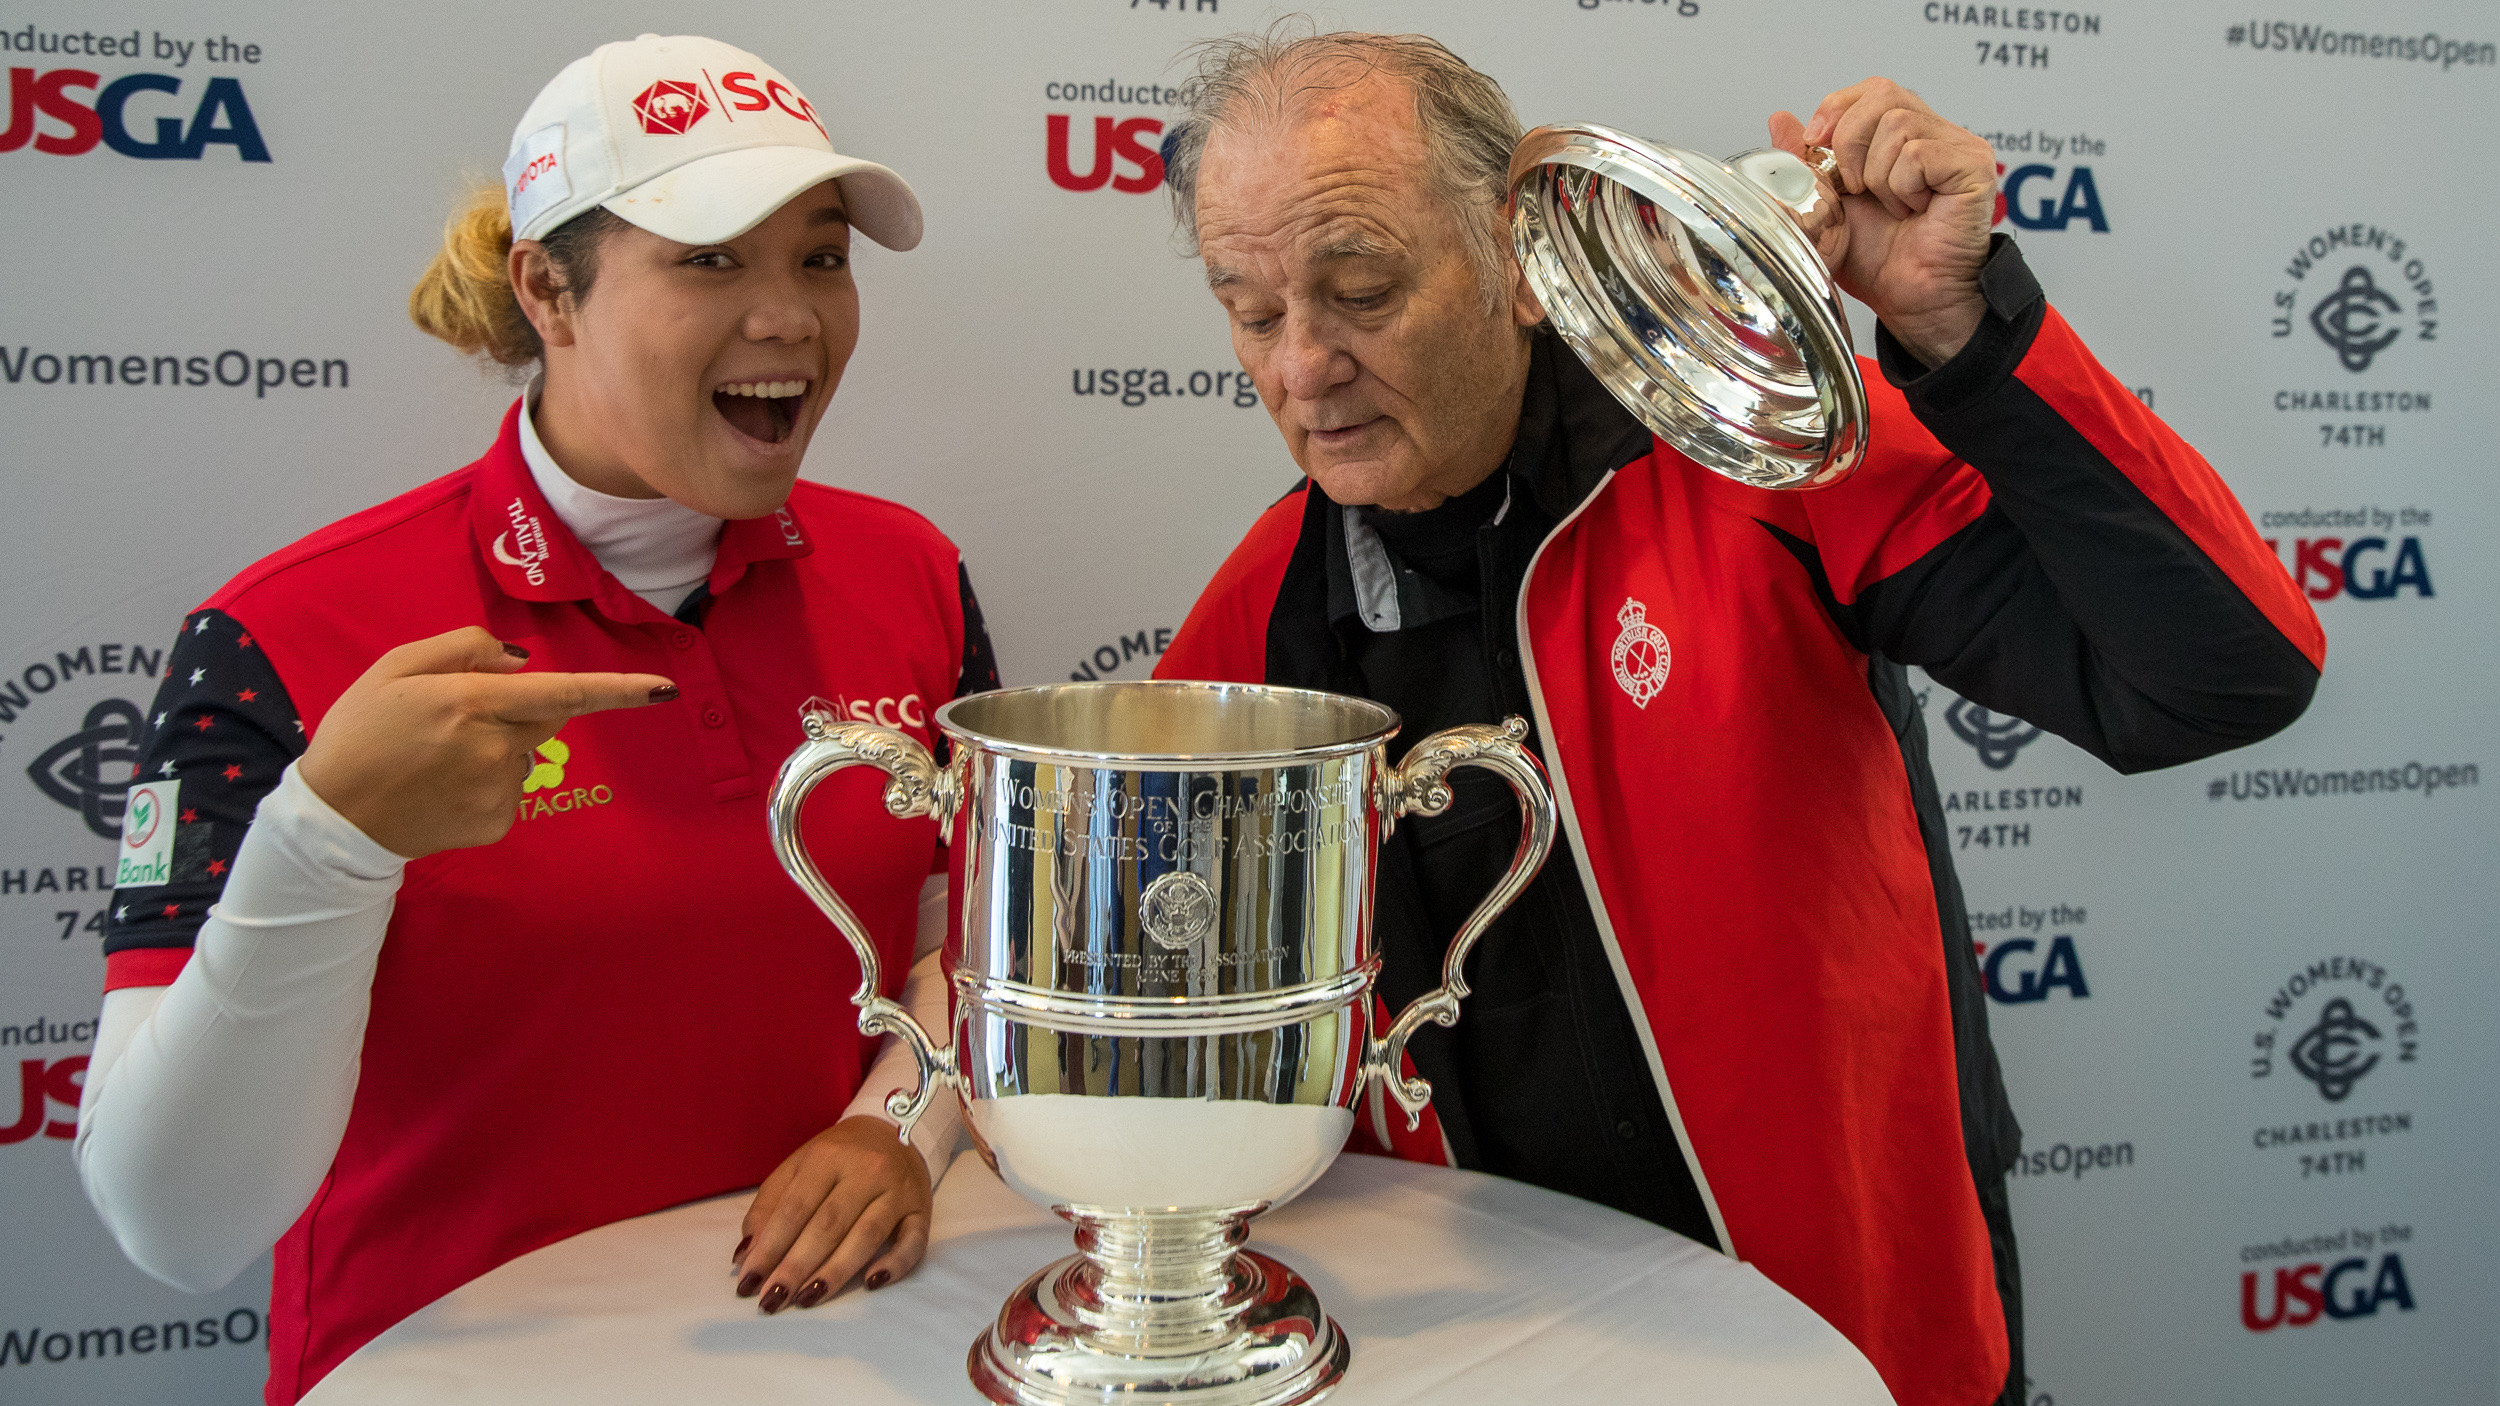 Bill Murray Ariya Jutanugarn United States Golf Association